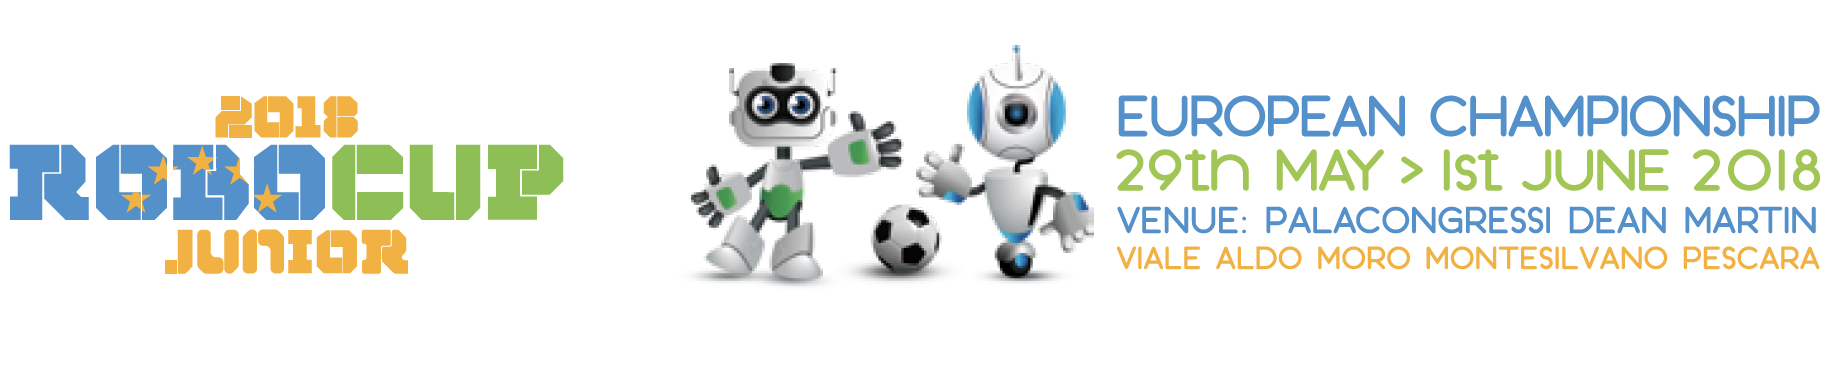 European RoboCupJunior Championship 2018